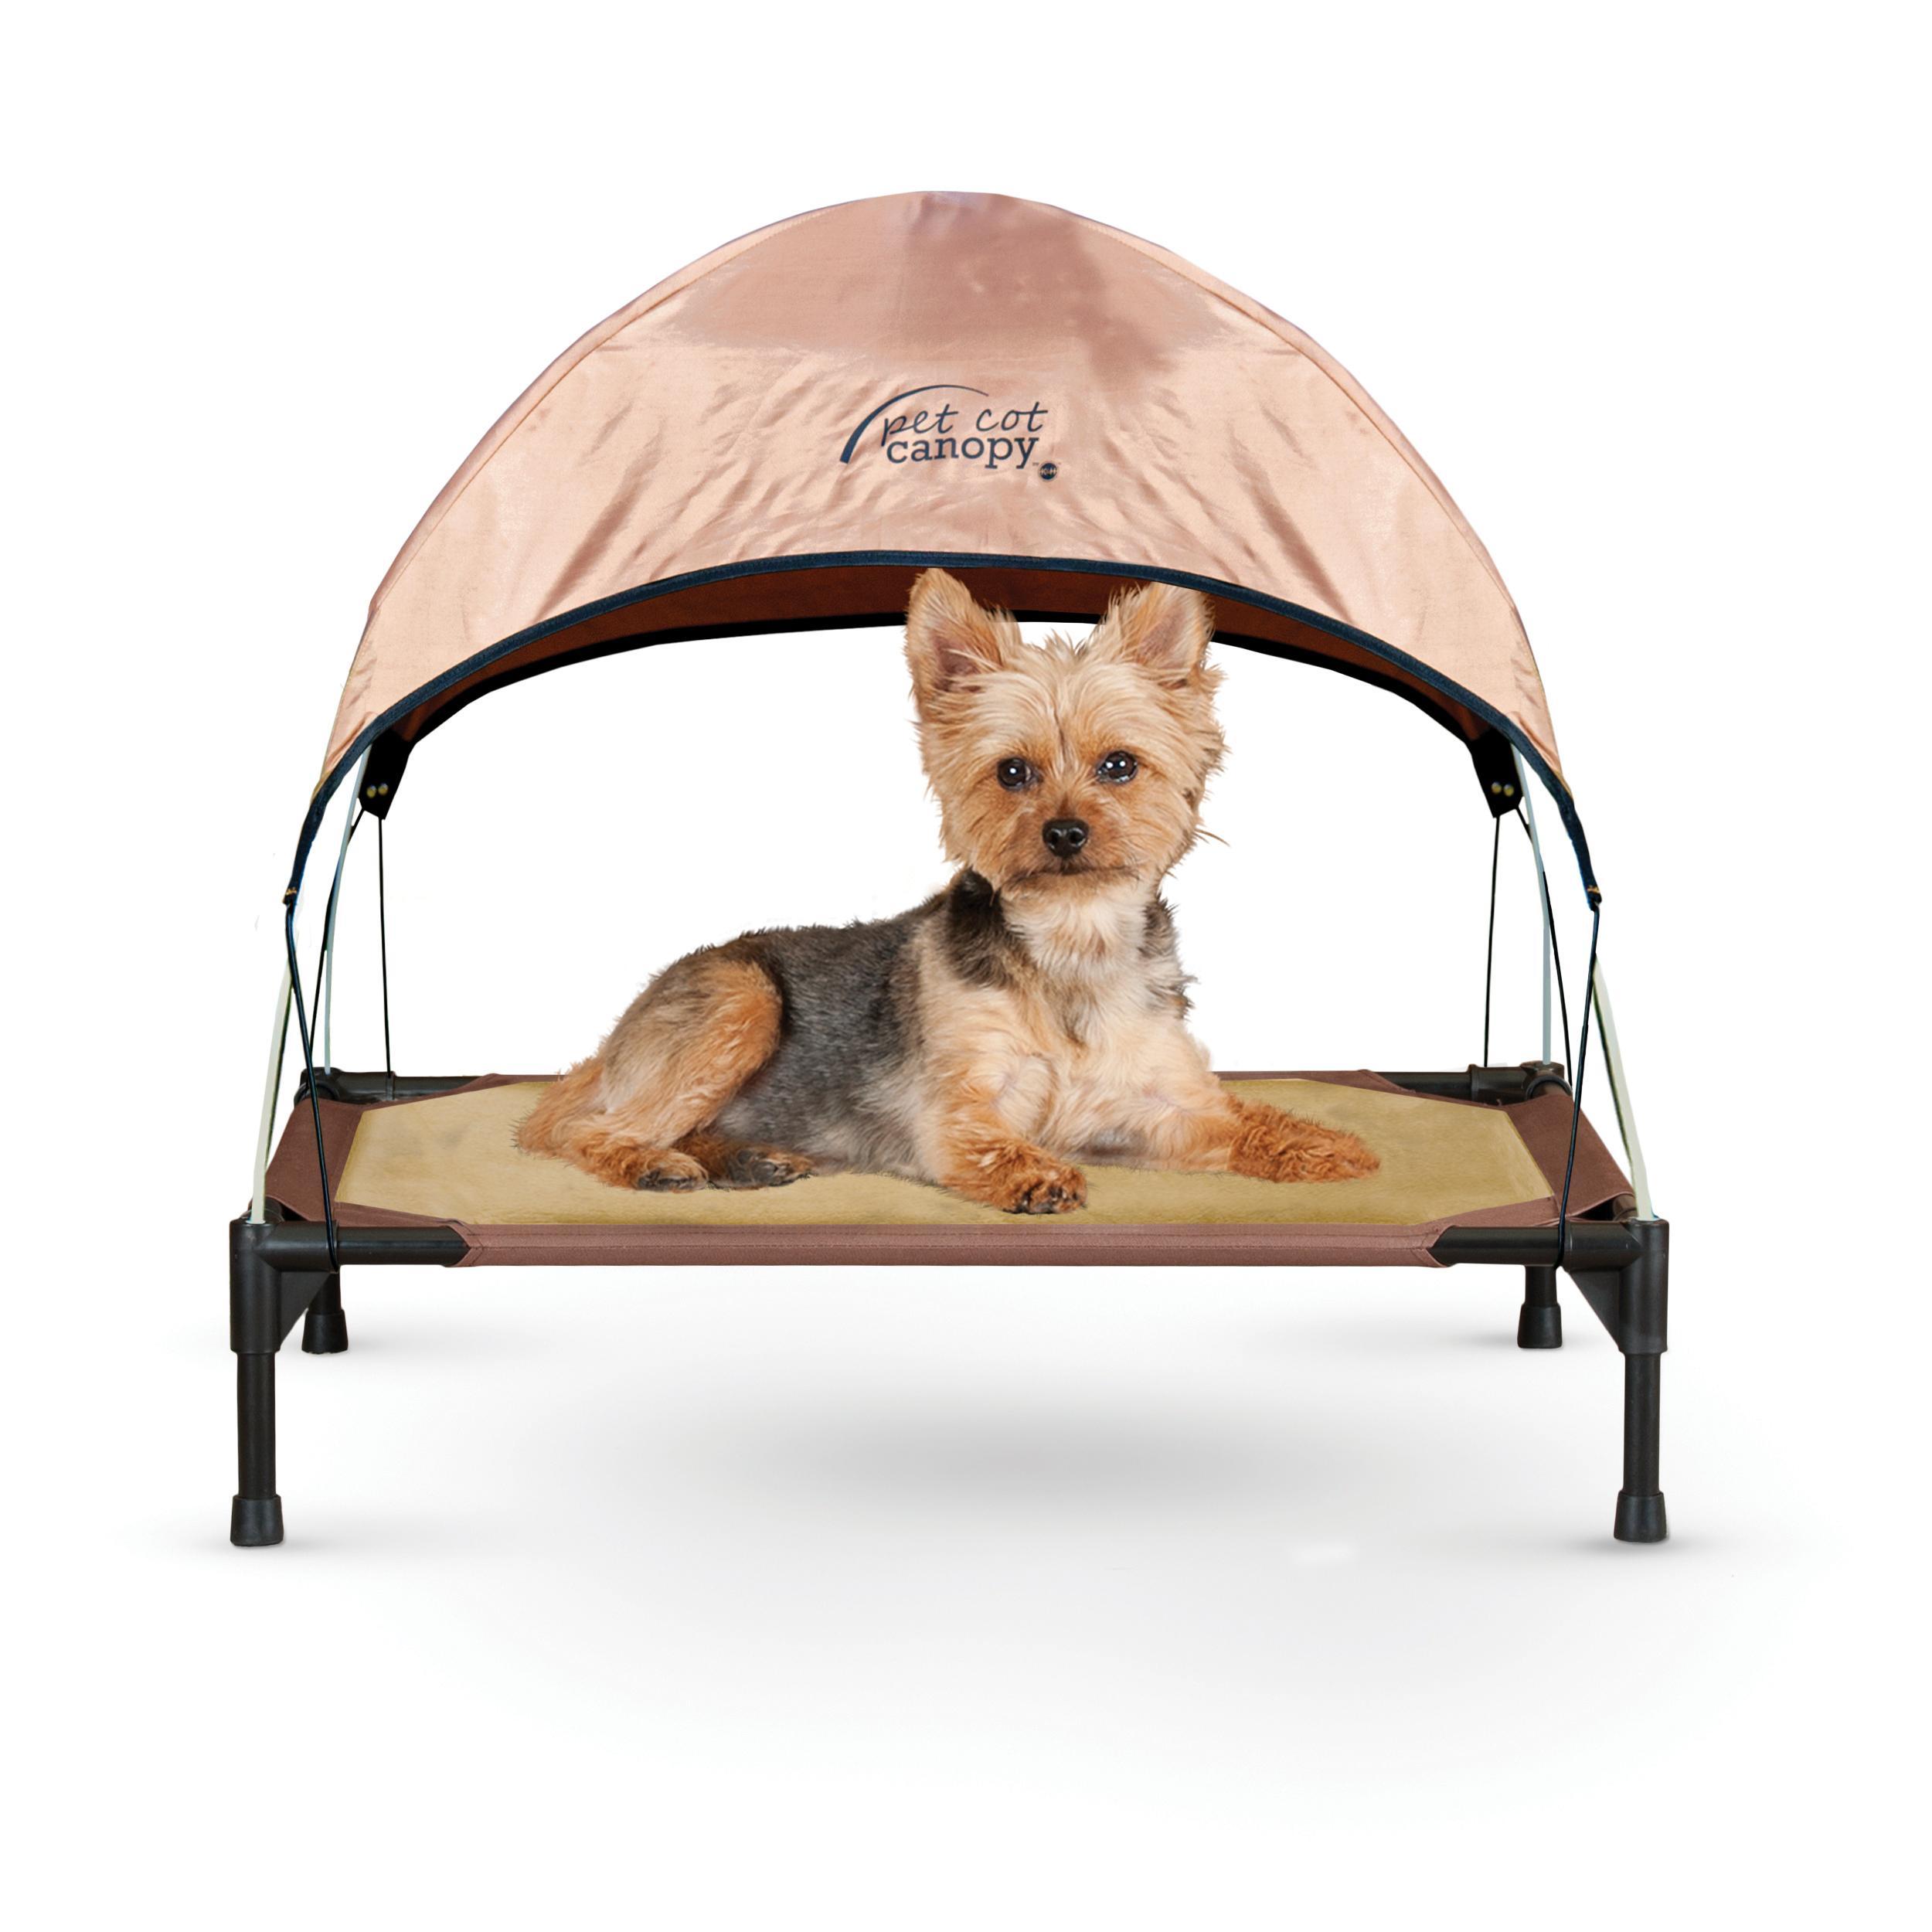 bed tent dog raised outdoor pet beds com life nicolasprudhon alfresco hammock